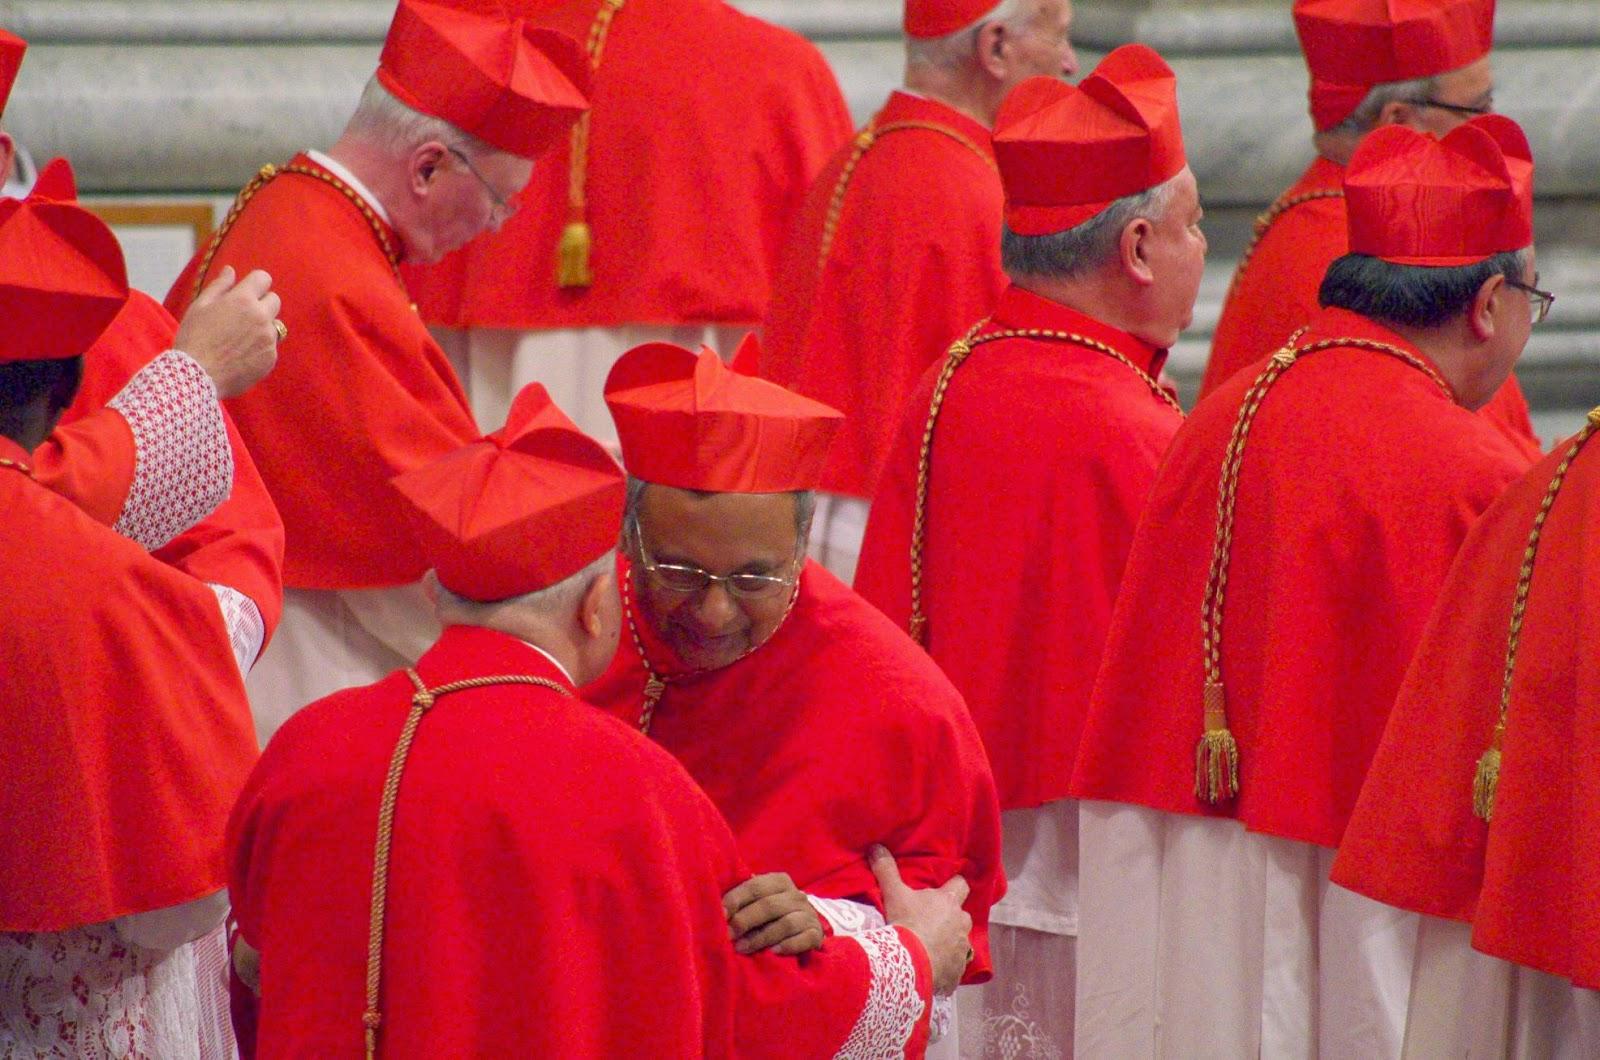 Numeri cardinali francese nombres cardinaux